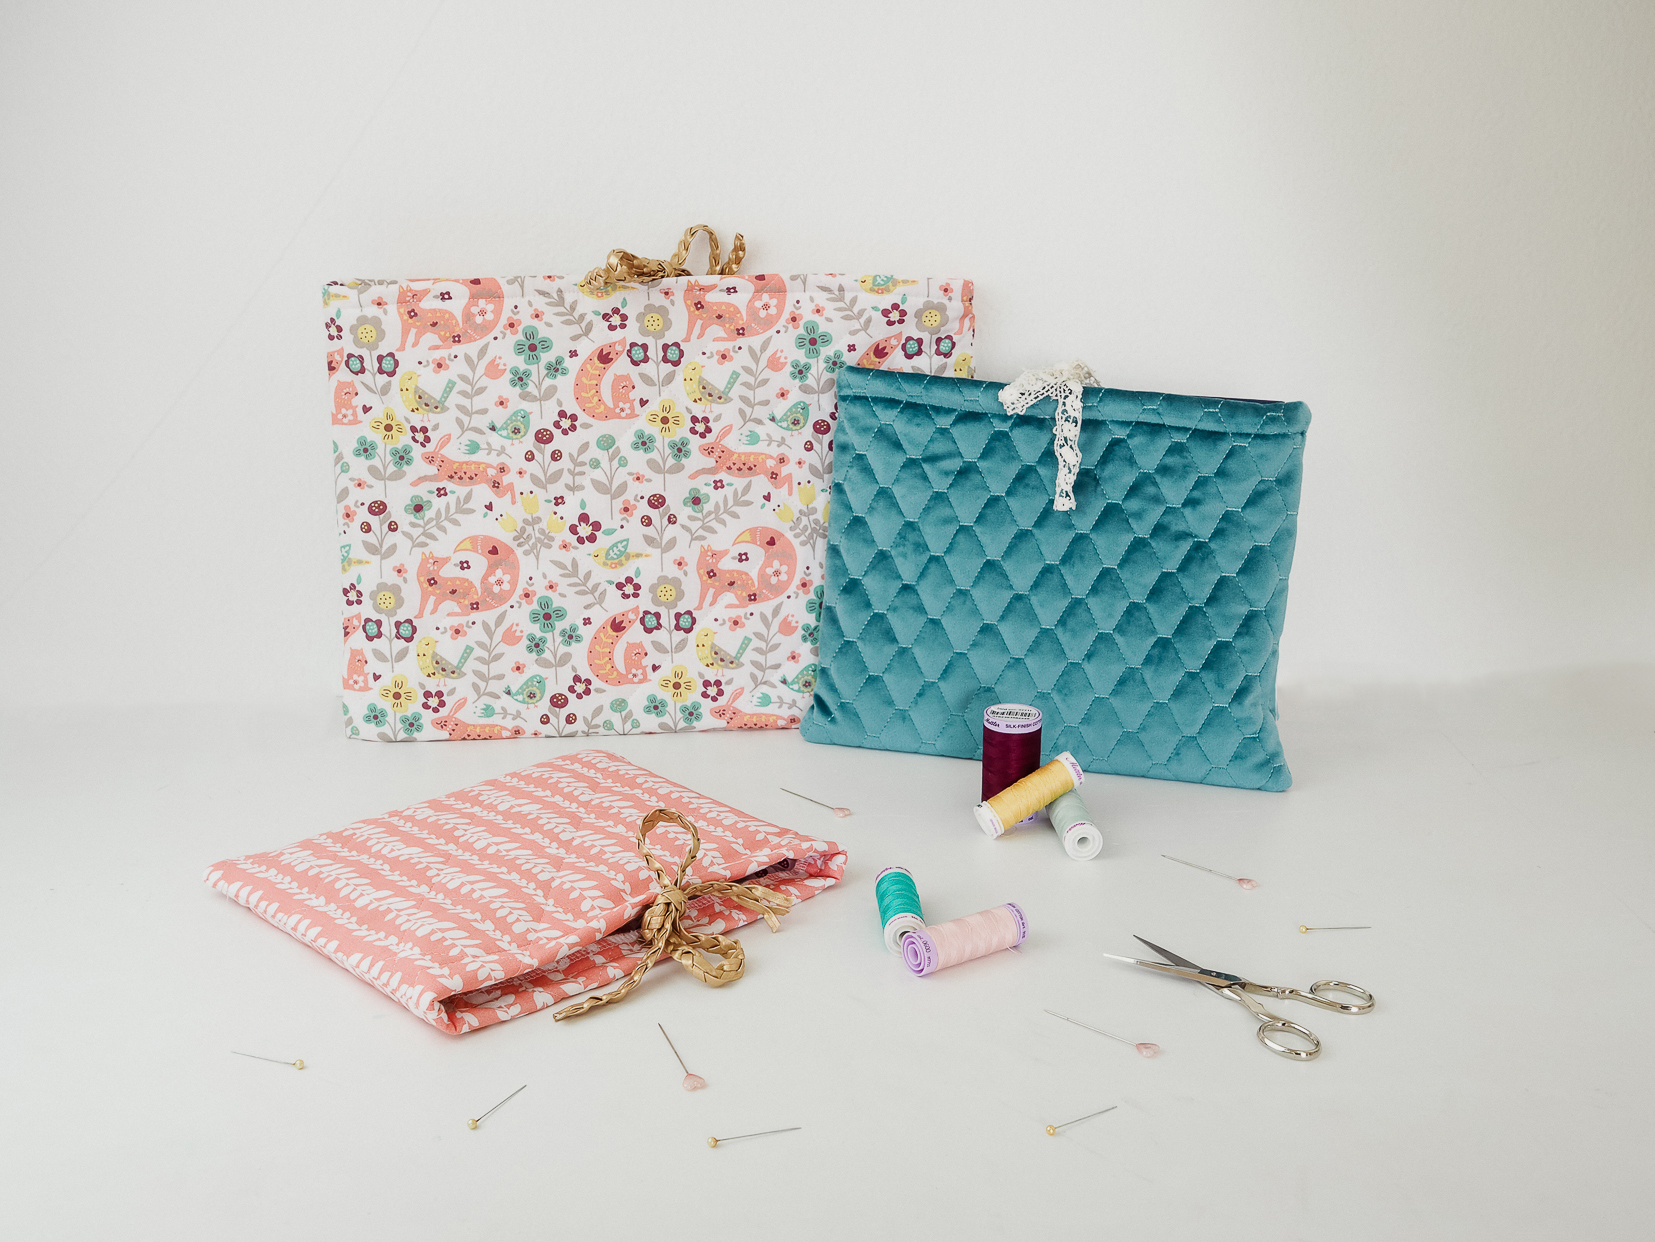 animer atelier couture débutant - mondial tissus